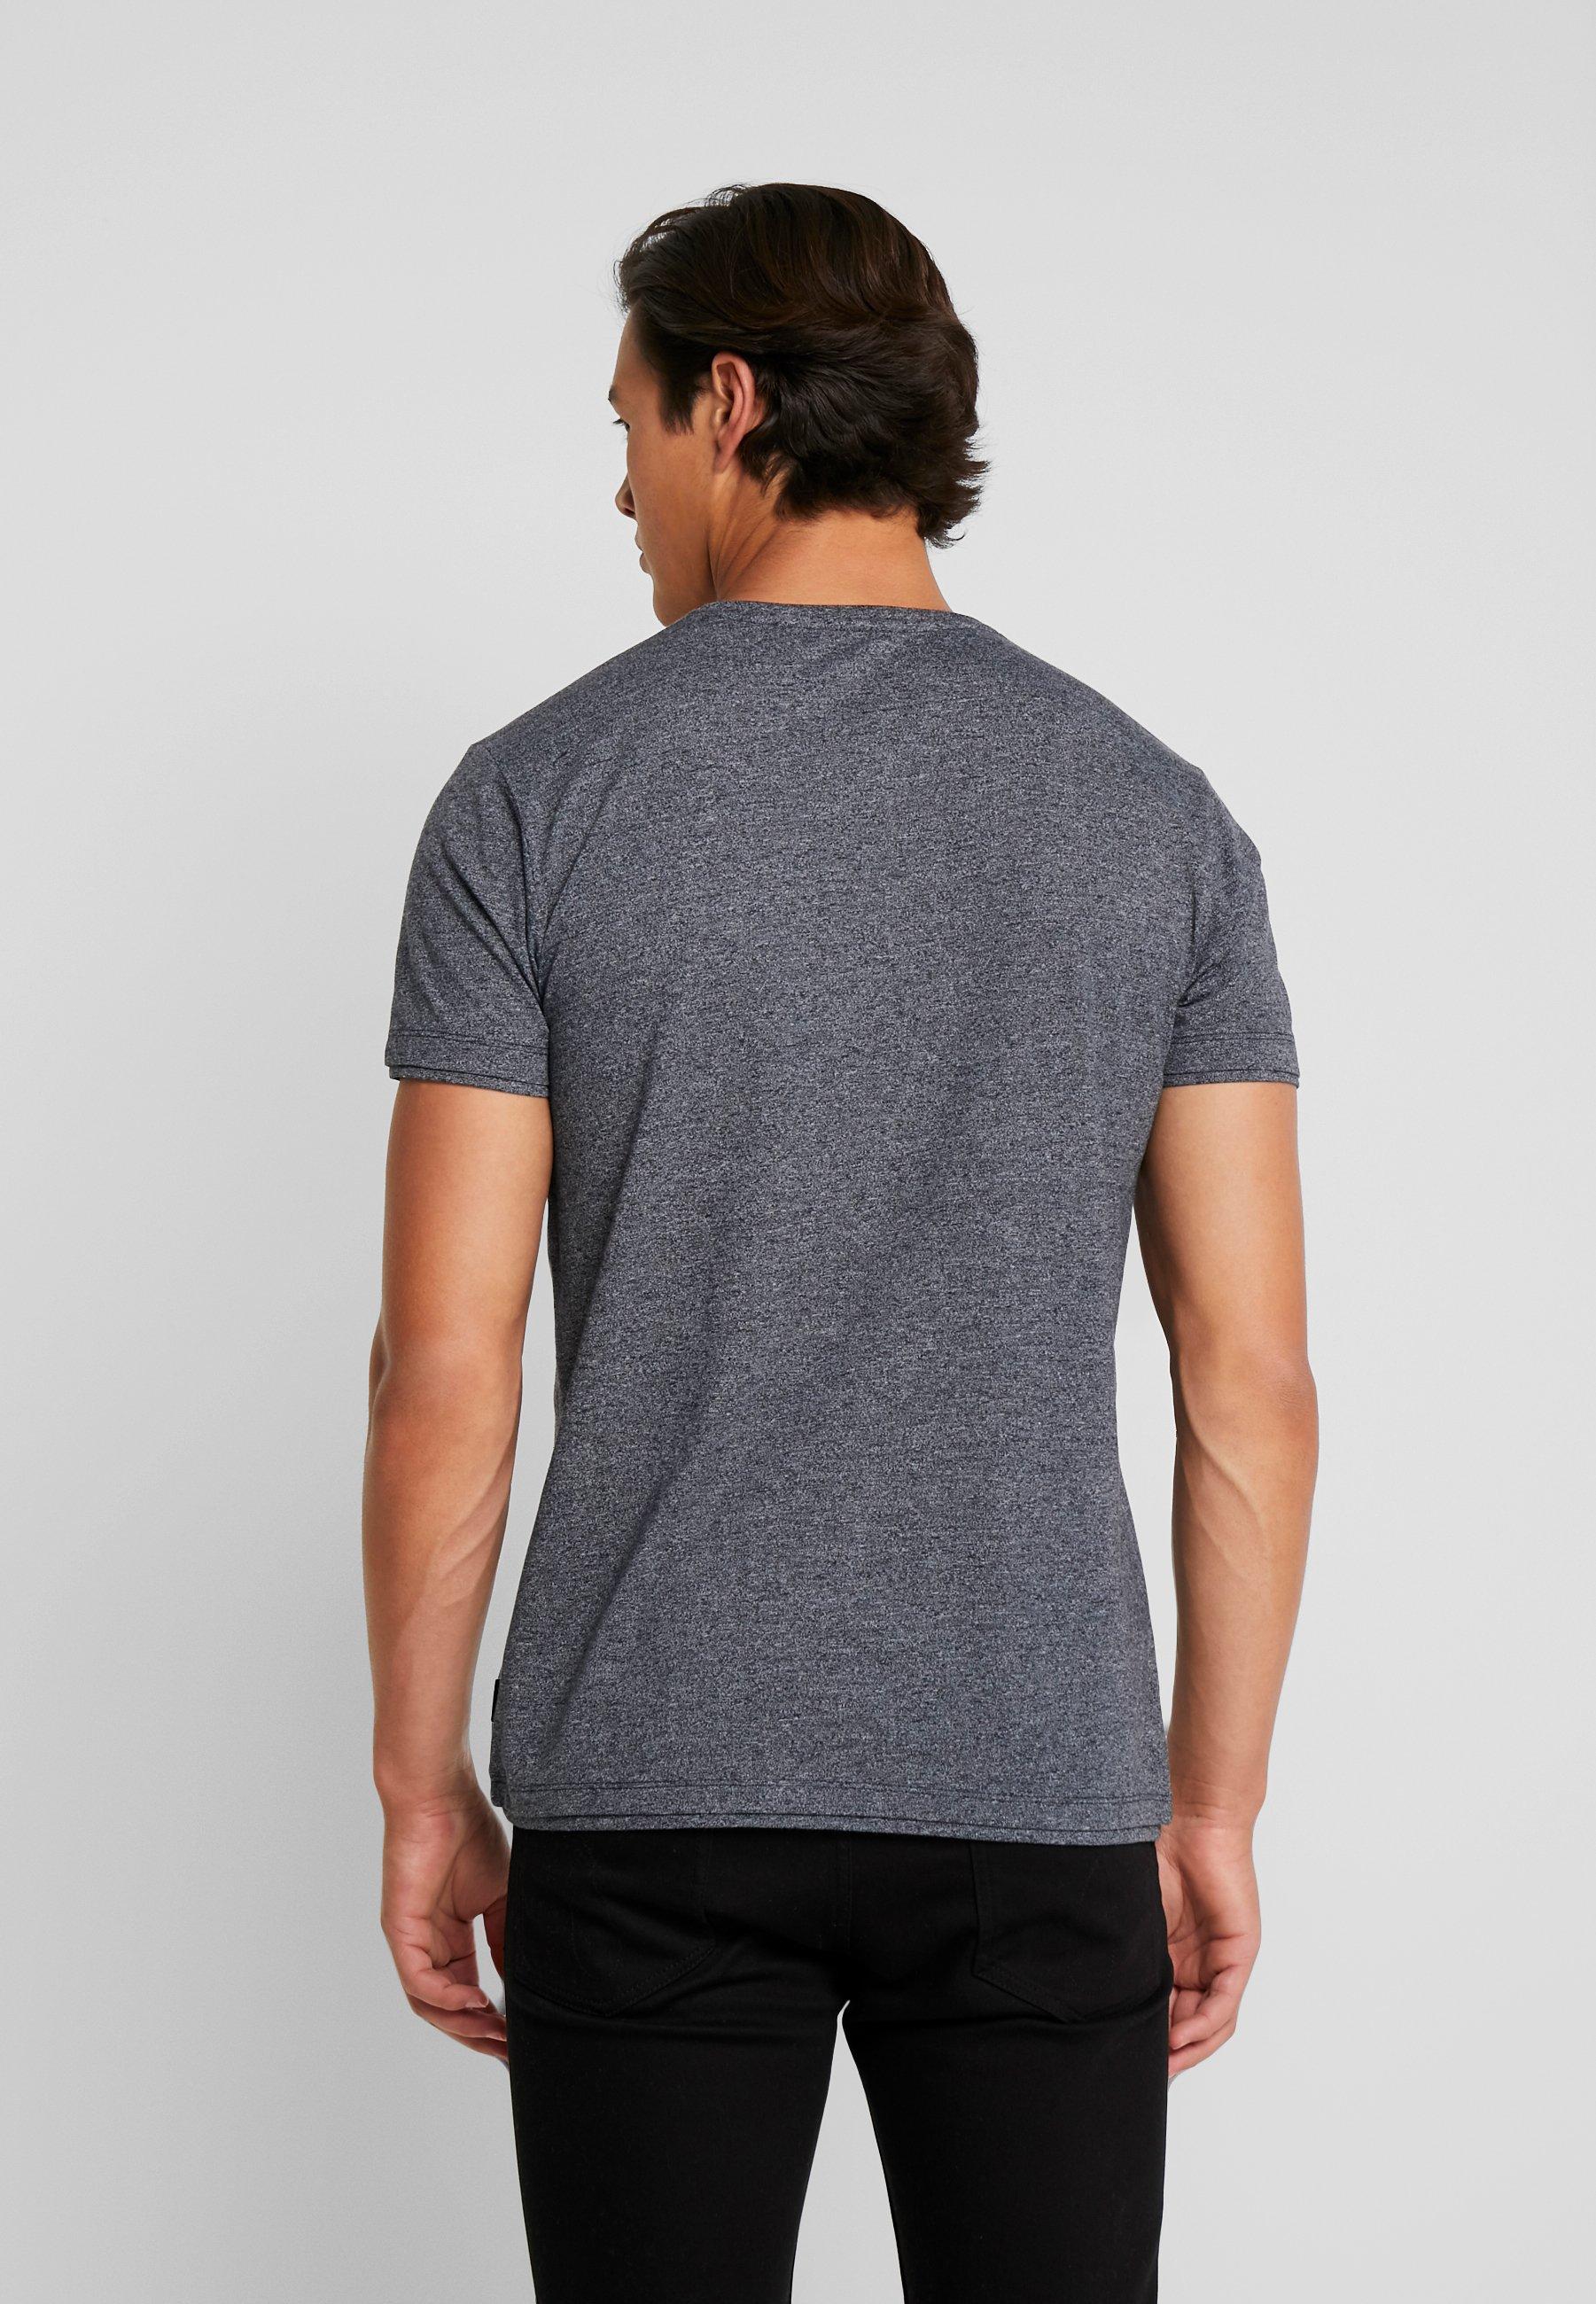 Peach Navy Basique shirt GrindlT Esprit MGSzpUqV